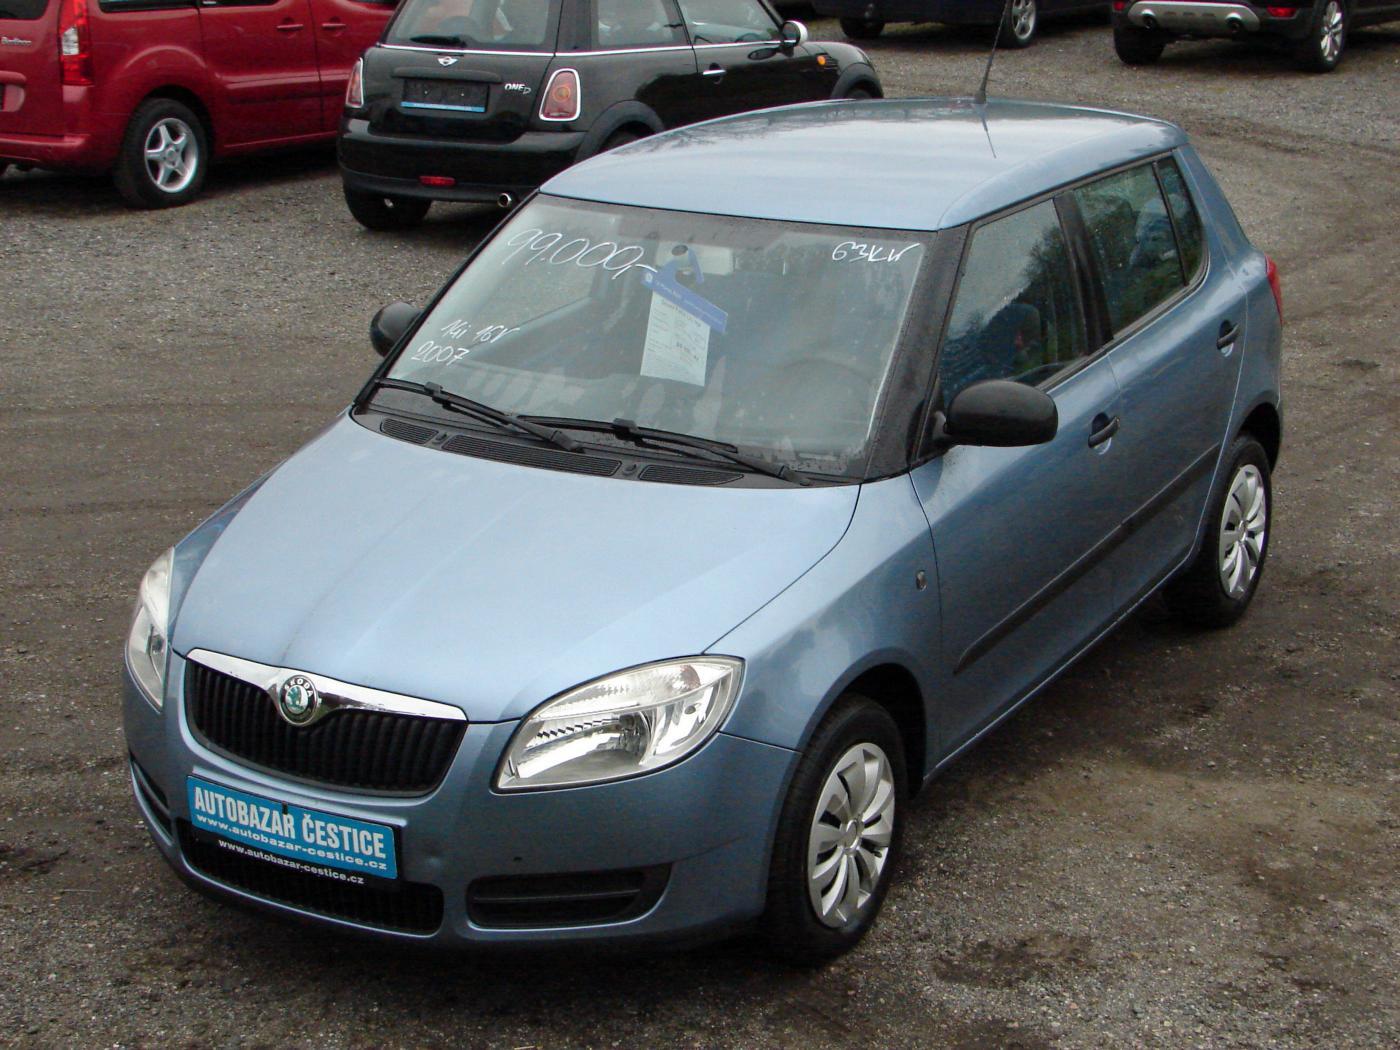 Škoda Fabia 1,4 i 16V